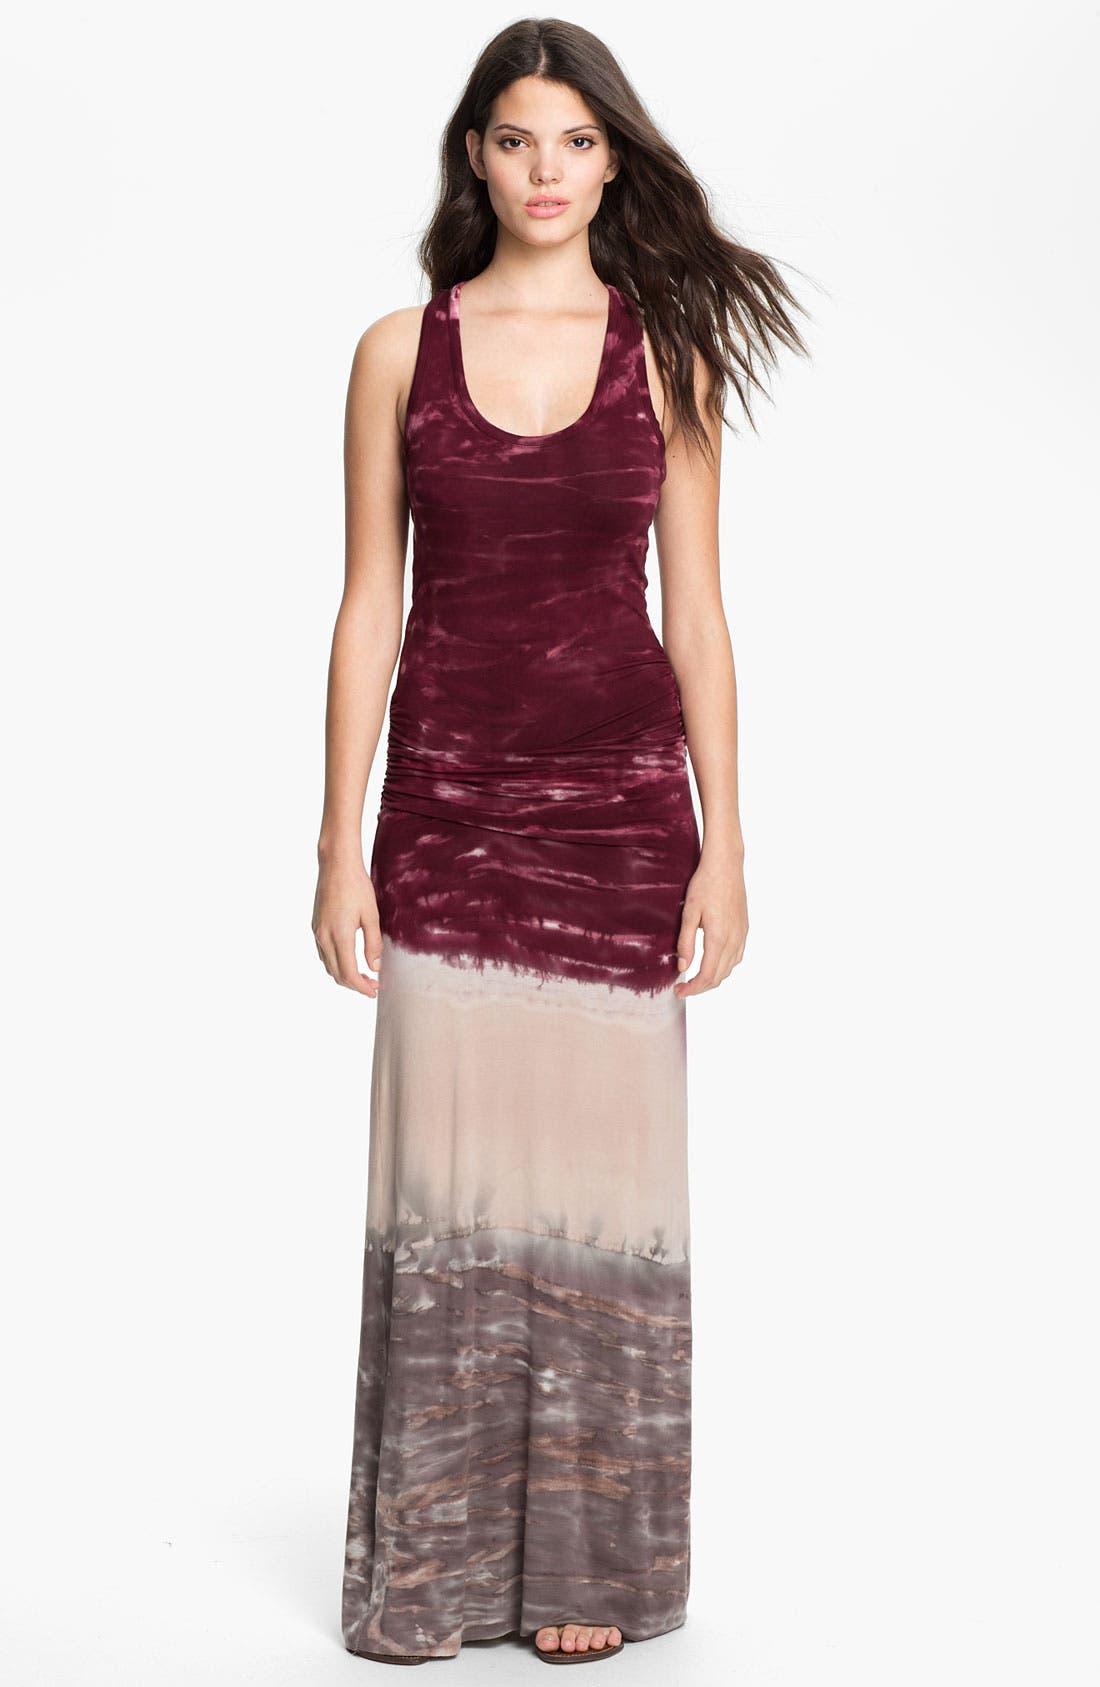 Alternate Image 1 Selected - Young, Fabulous & Broke 'Hamptons' Maxi Dress (Nordstrom Exclusive)